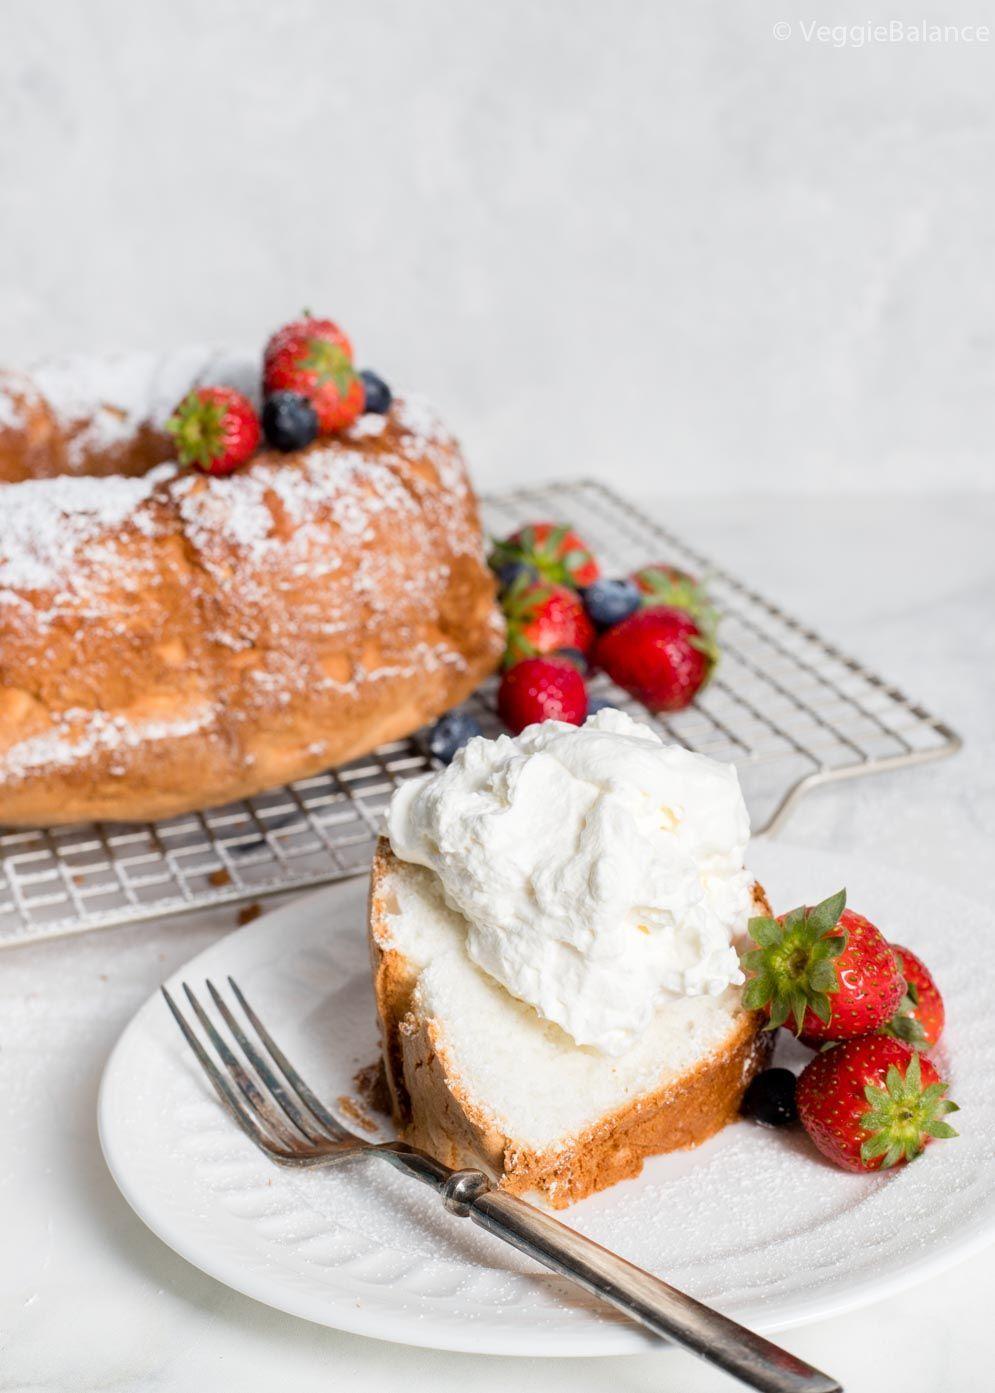 Gluten free angel food cake easy recipes by veggie